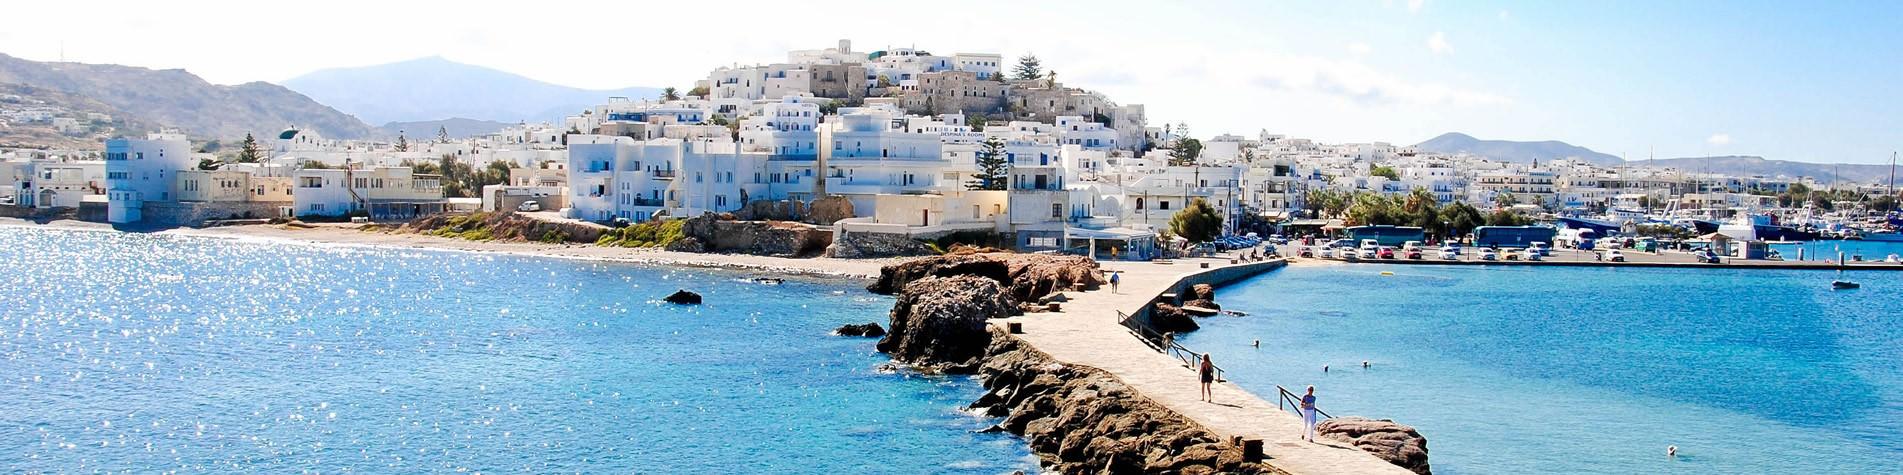 Naxos Island Holidays with Cyplon Holidays